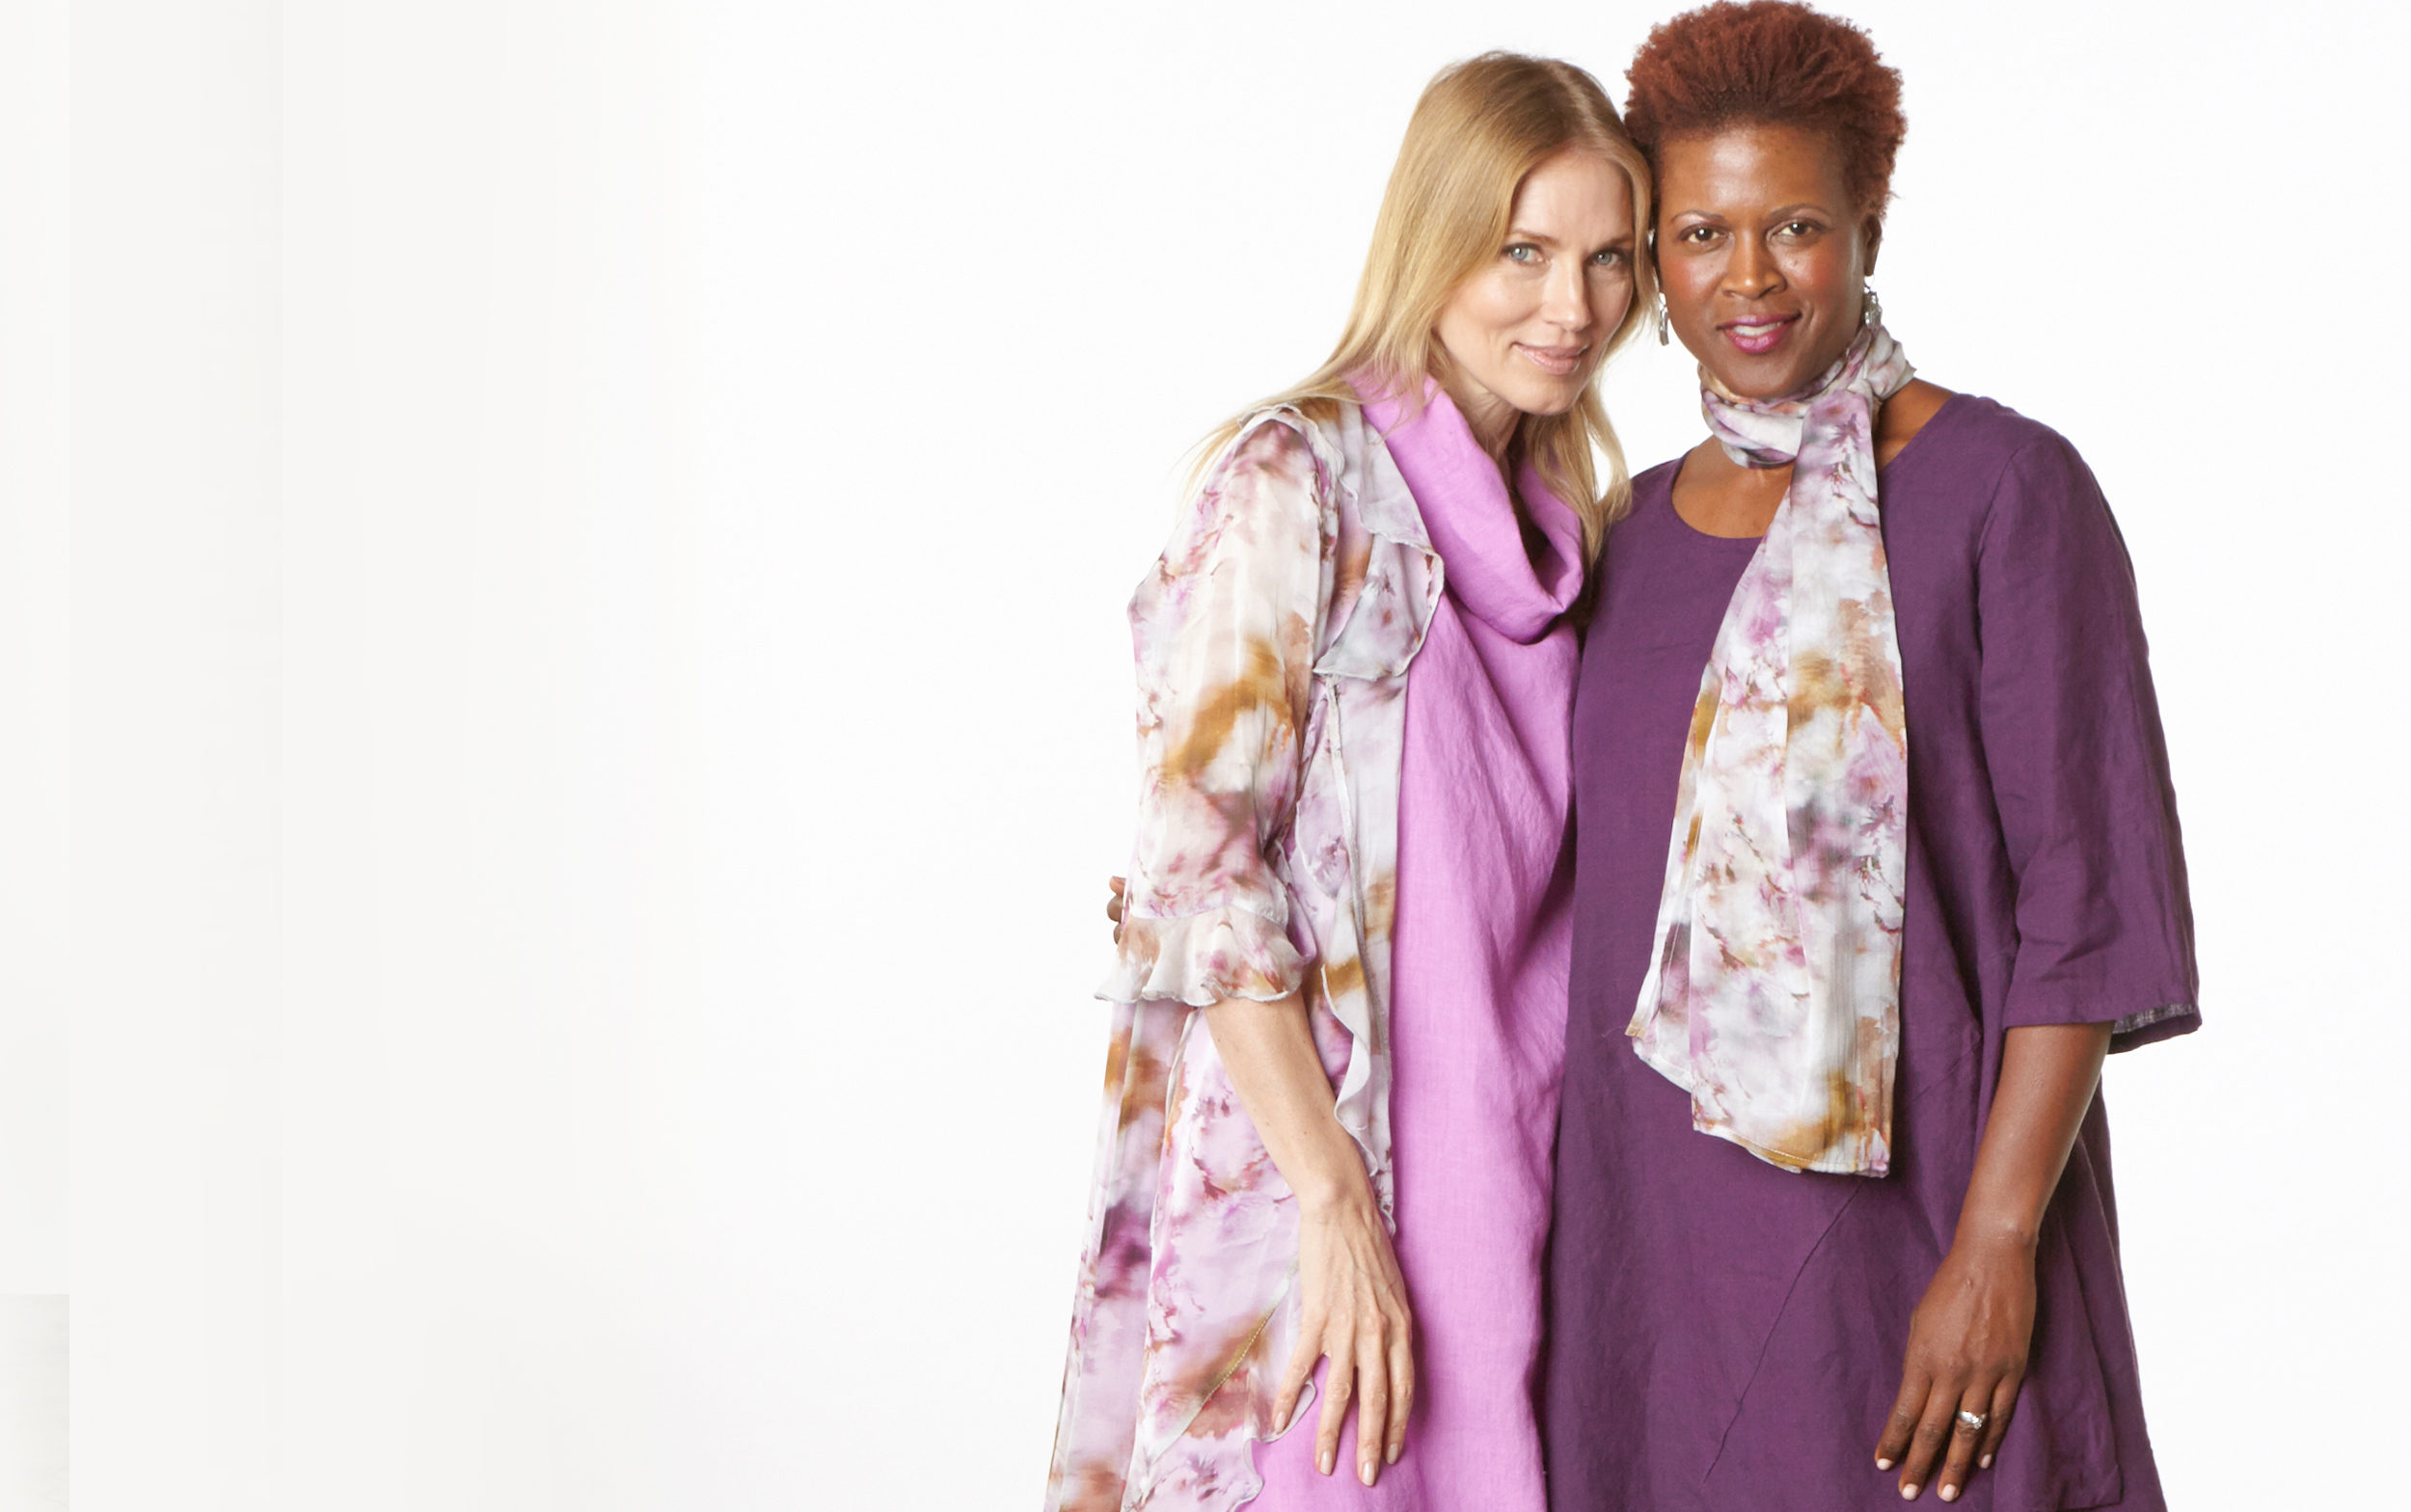 Camille Cardigan, Scarf in Versailles Sheer Silk, Henrietta Dress in lxia, Naida Tunic in Myth Light Linen